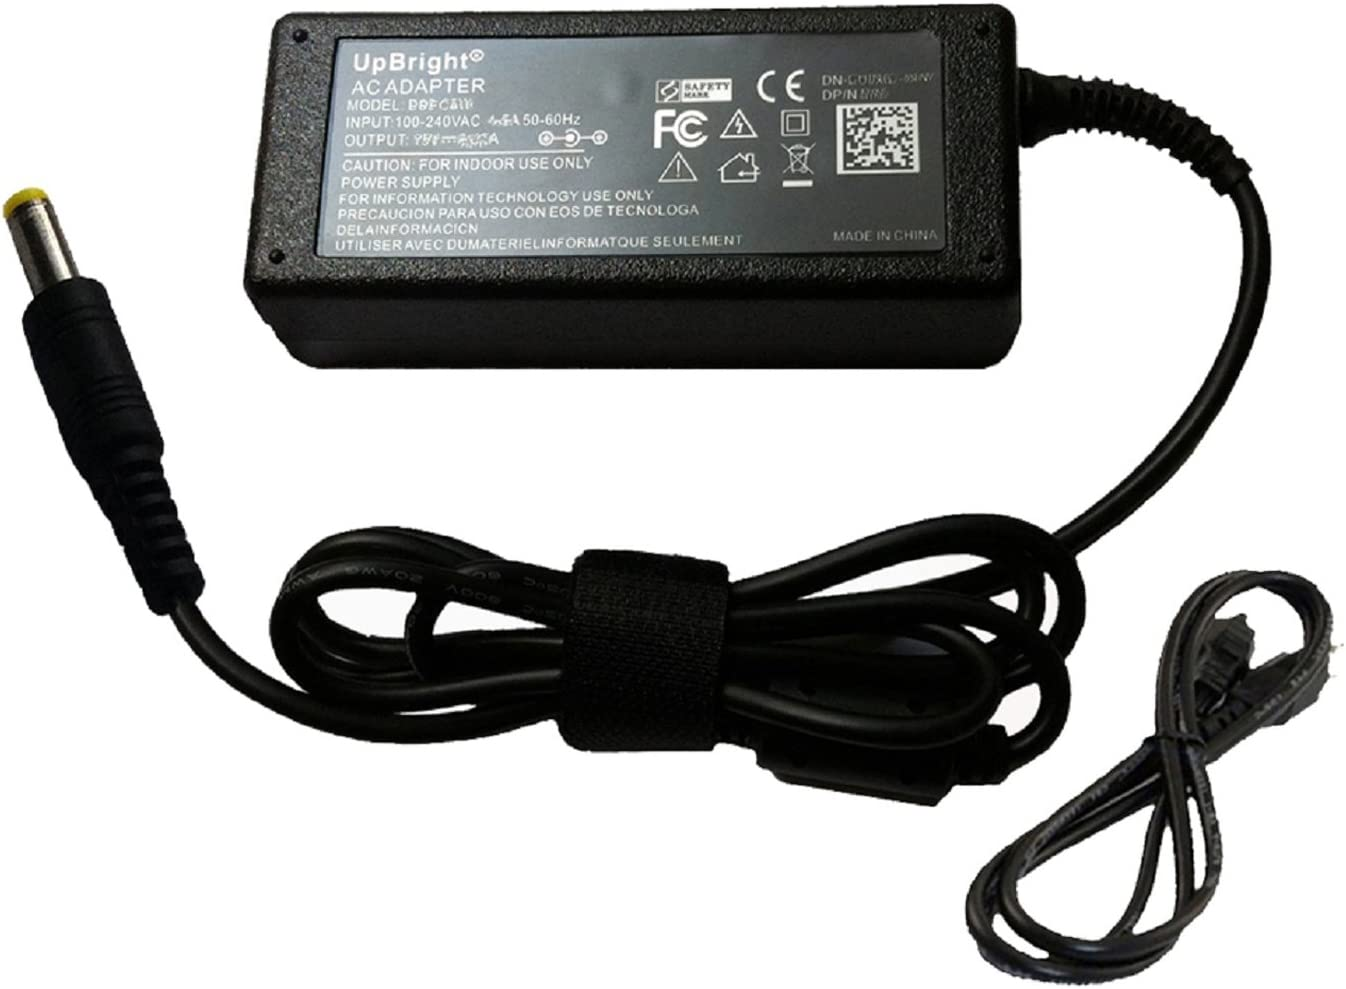 JWBS-14 JPW Power Cord Switch to Power 995002